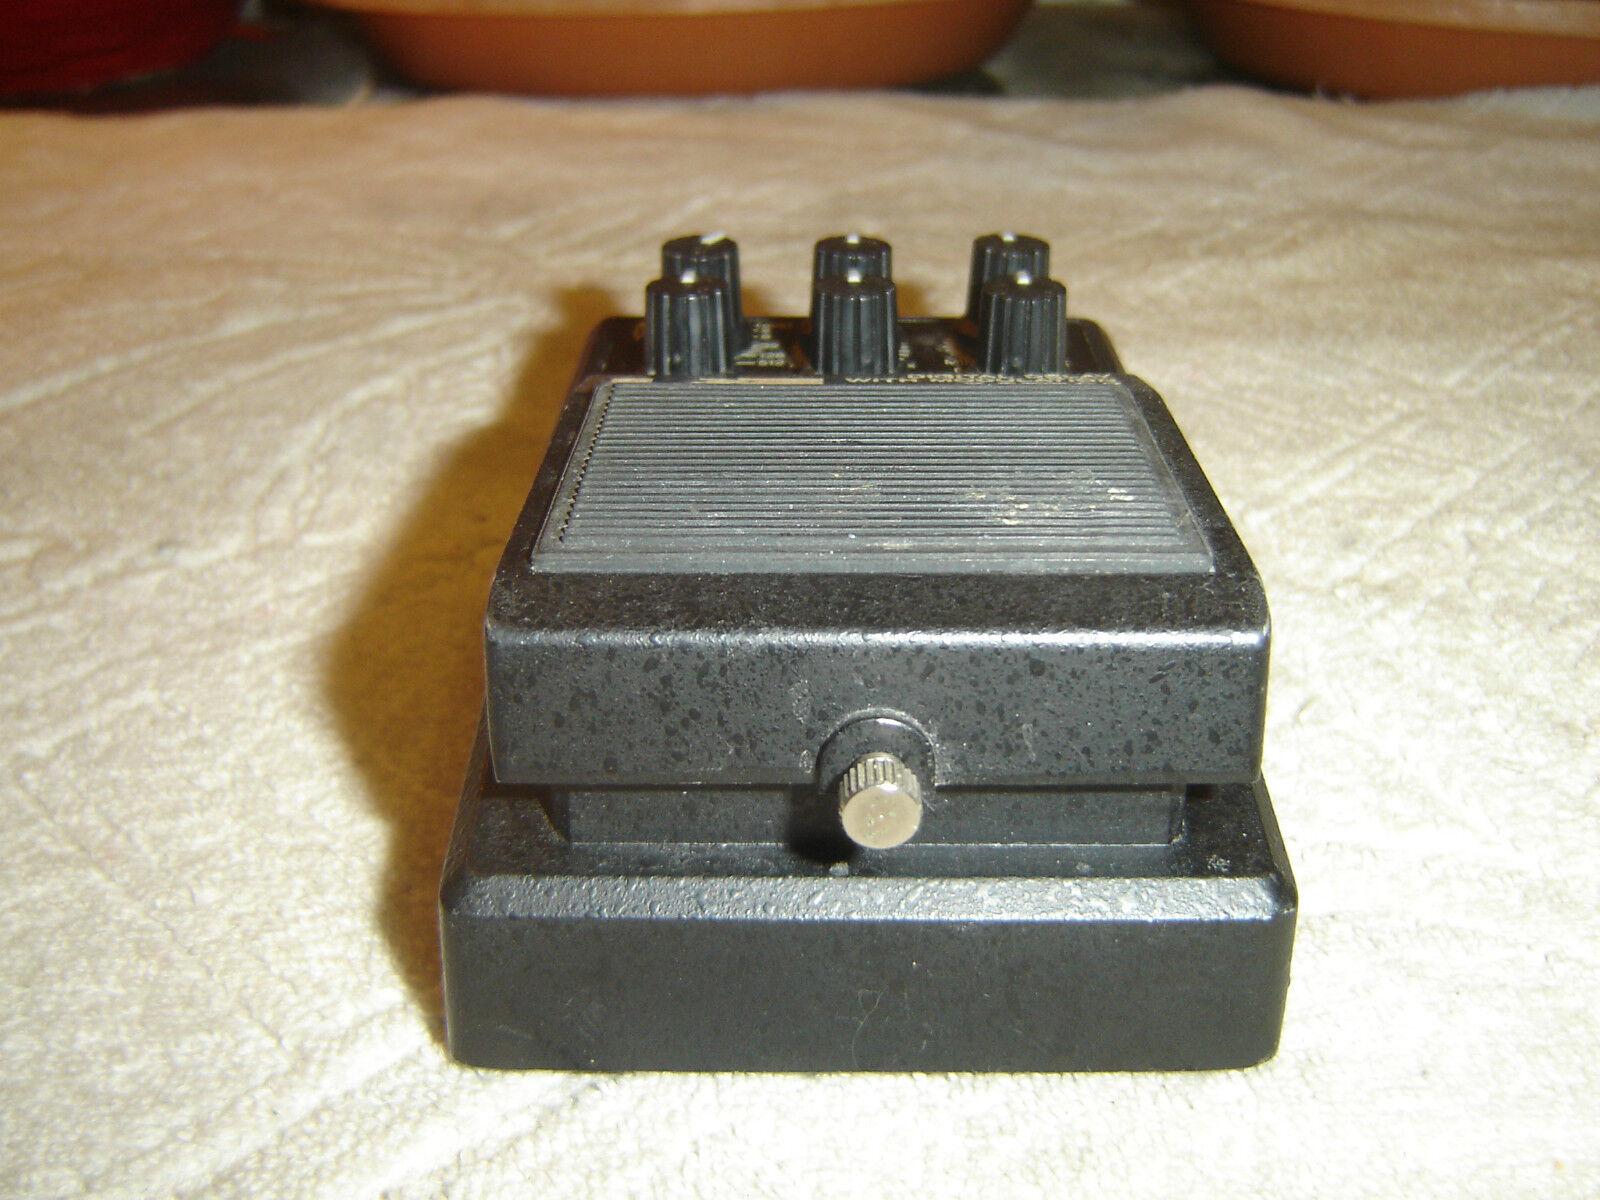 Vesta Fire MDX, Digital Delay with Modulation, Vintage Guitar Pedal